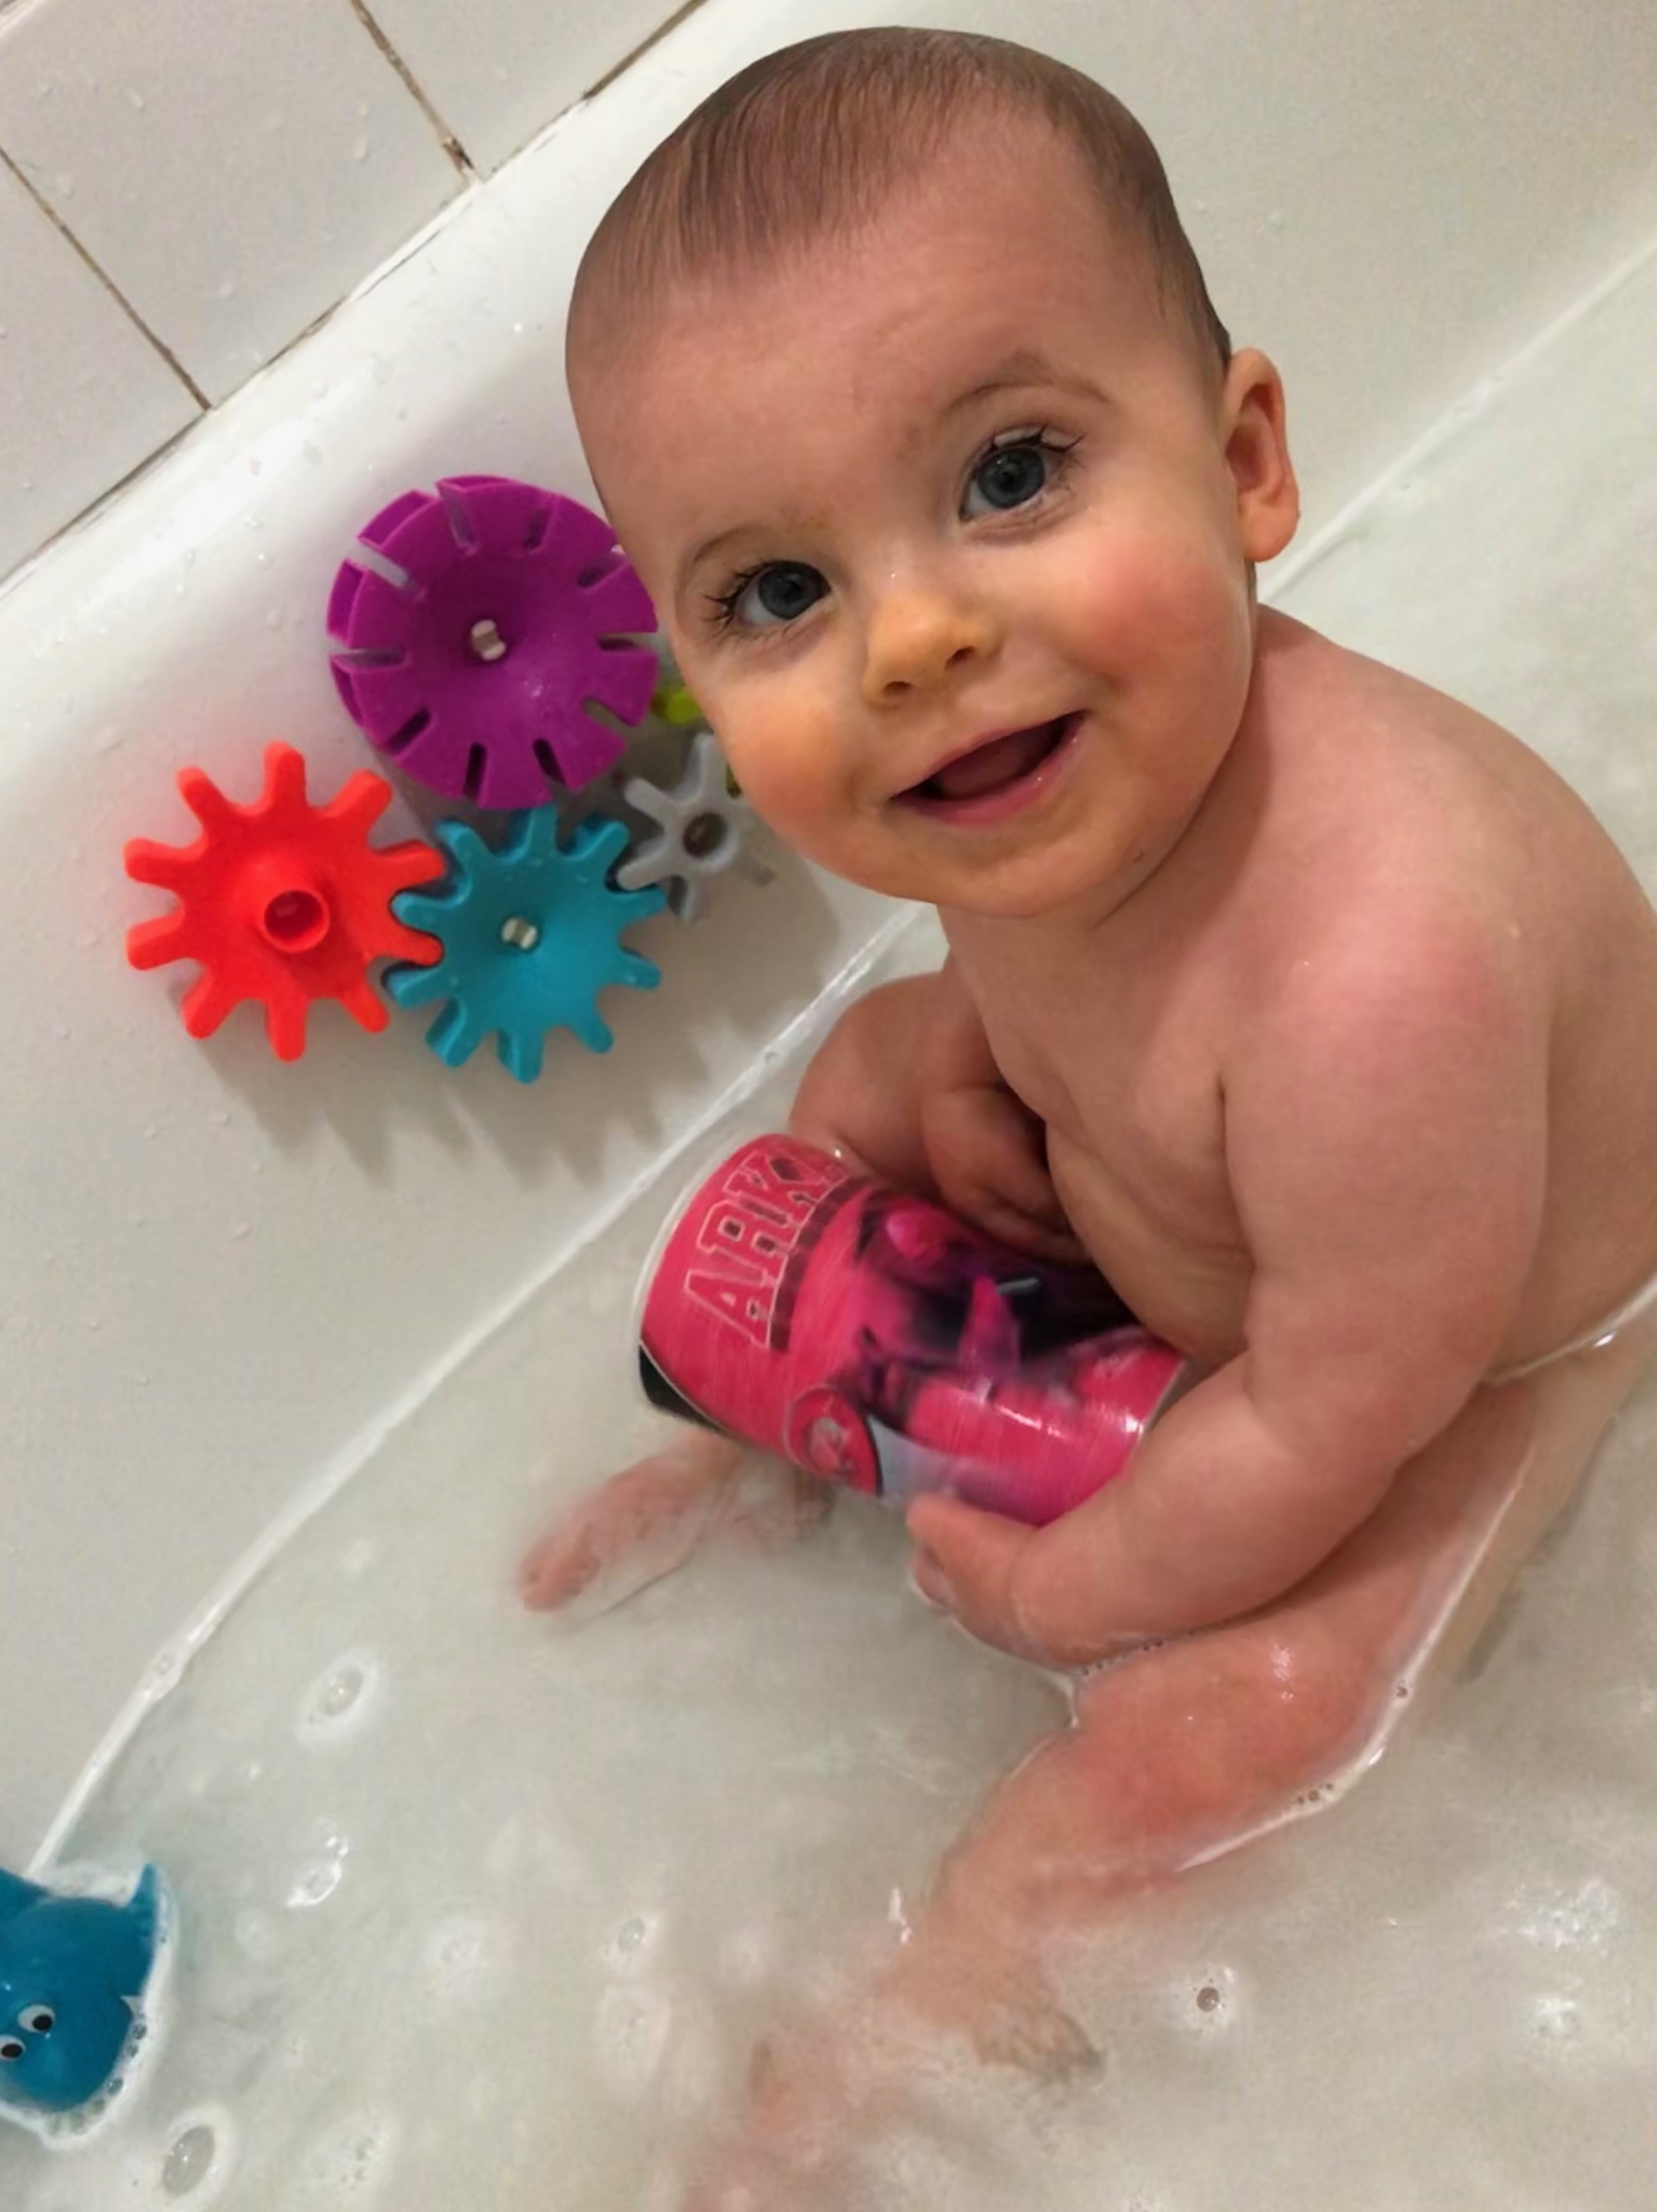 skyler bath 9 months